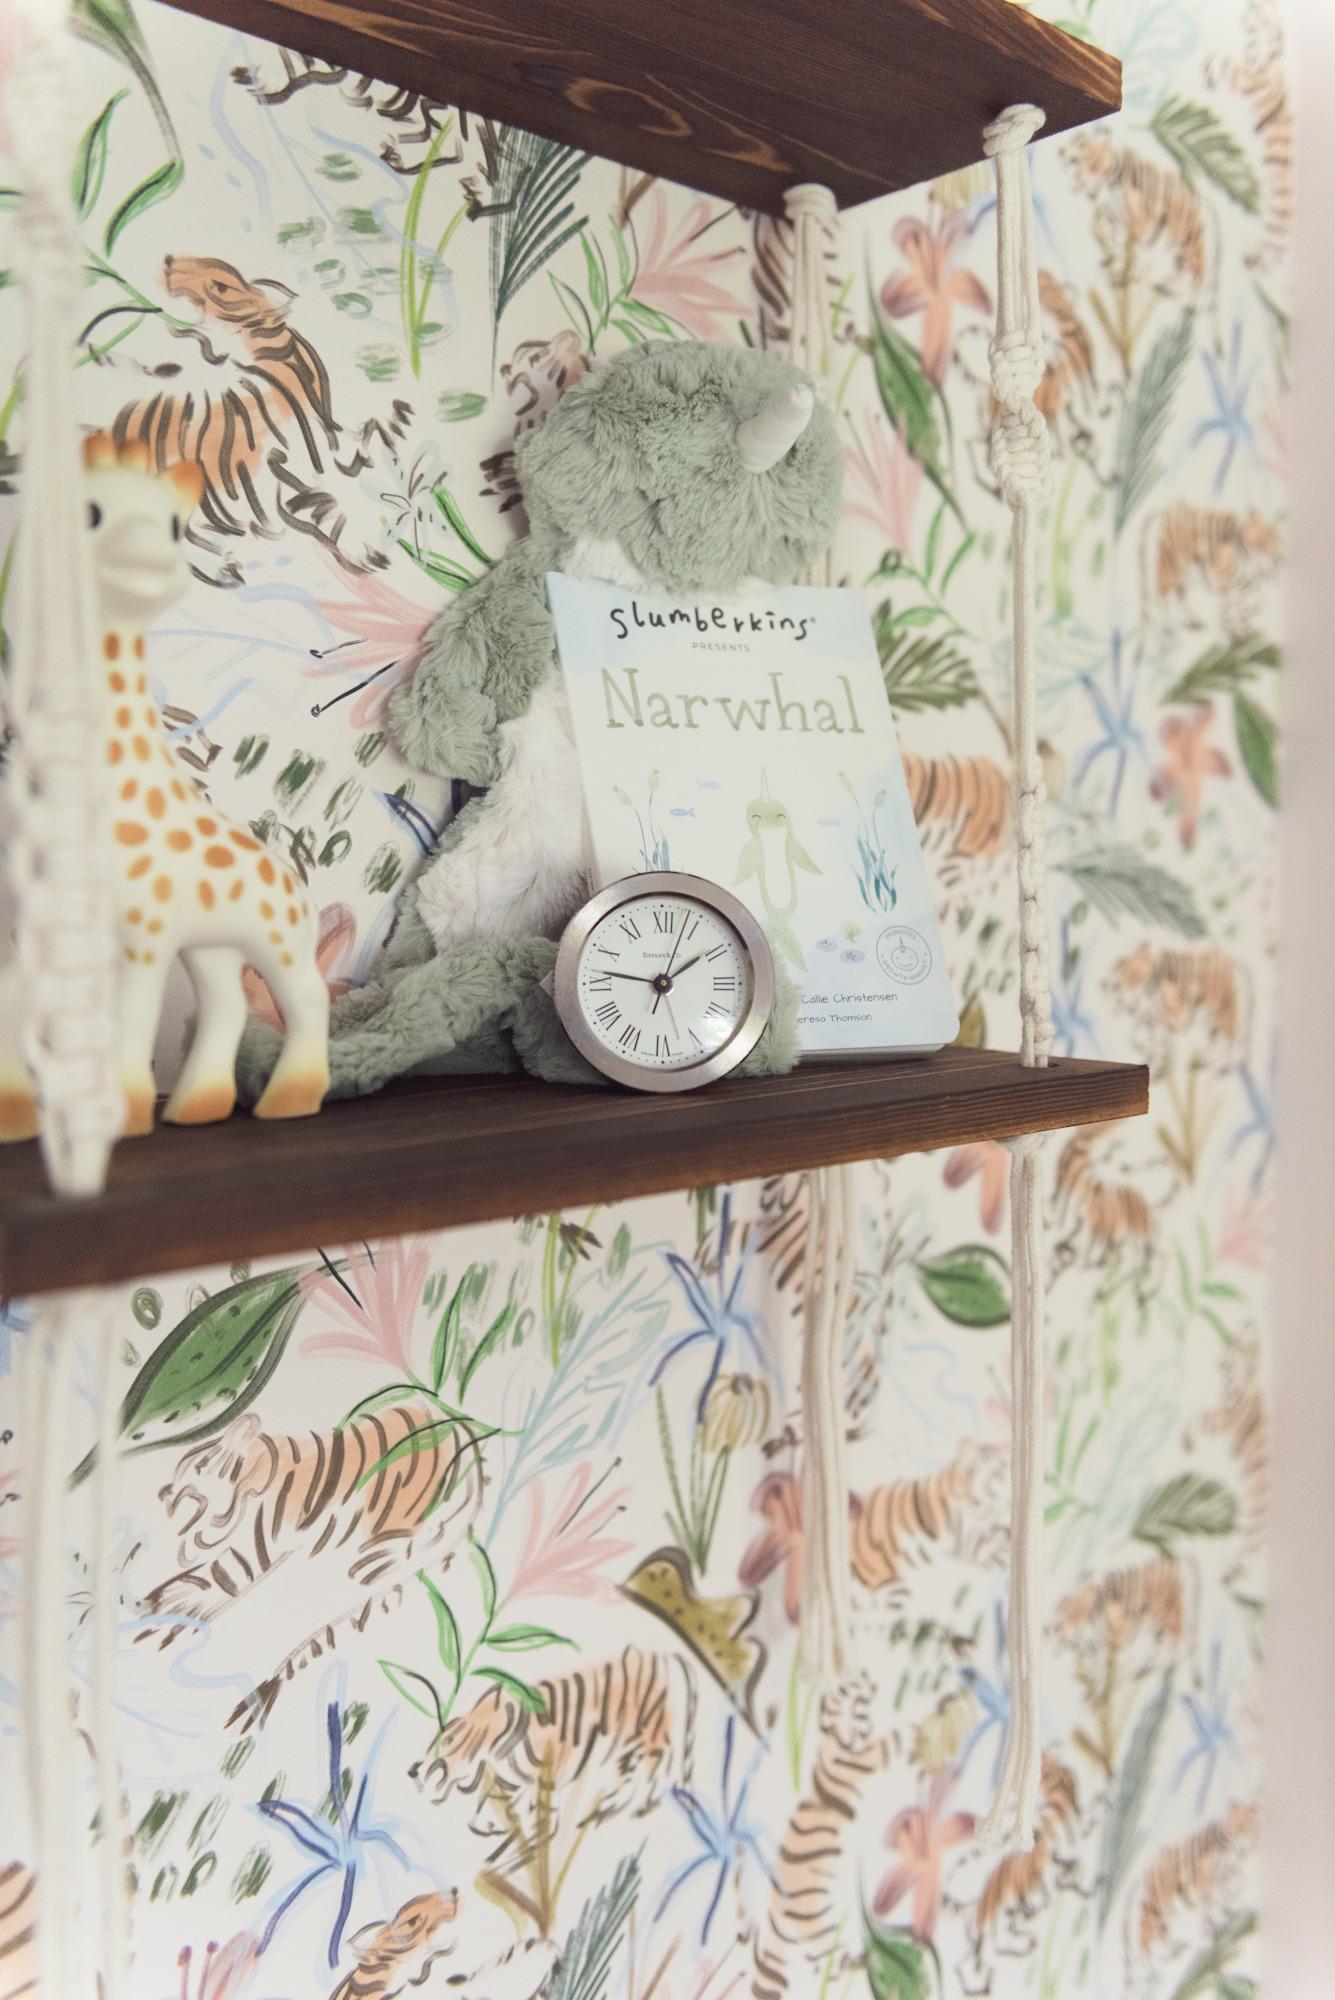 Macrame Hanging Wall Shelf in Girl's Nursery